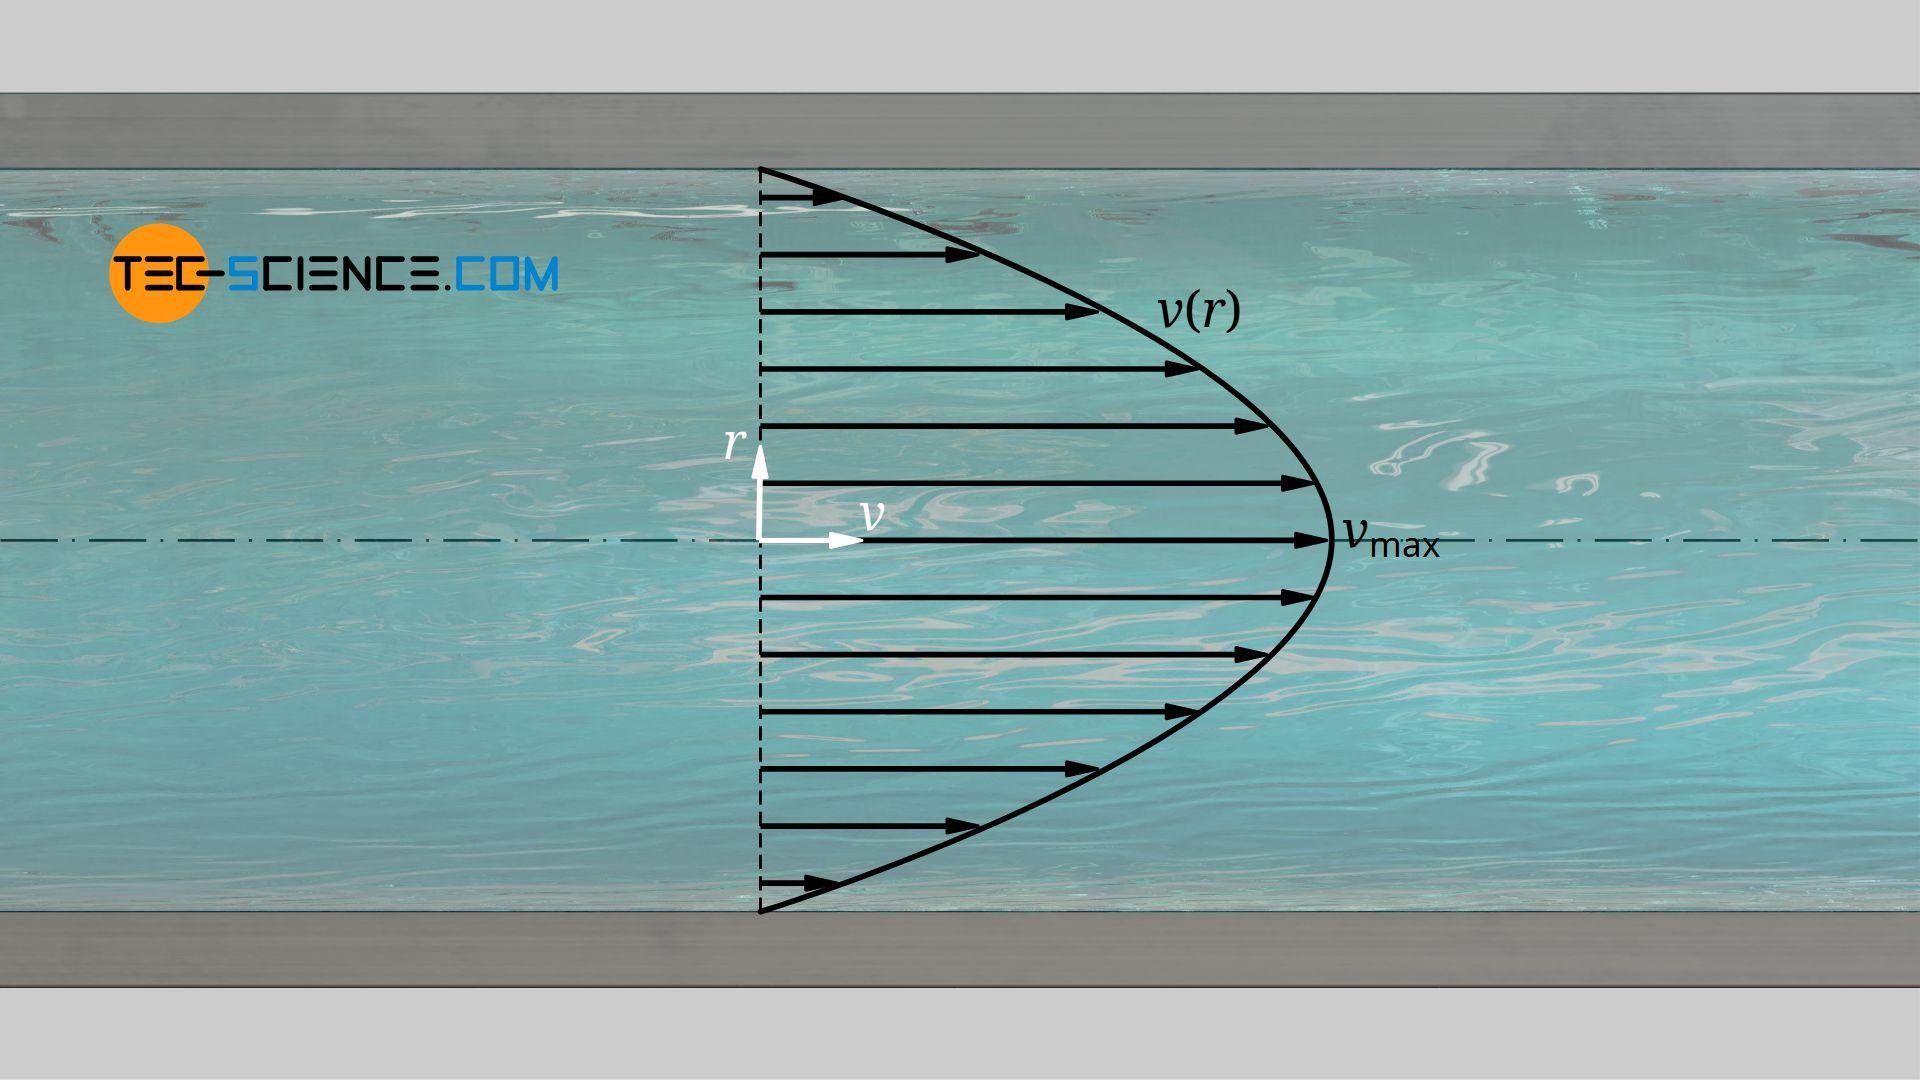 Parabolic velocity profile of the Hagen-Poiseuille flow